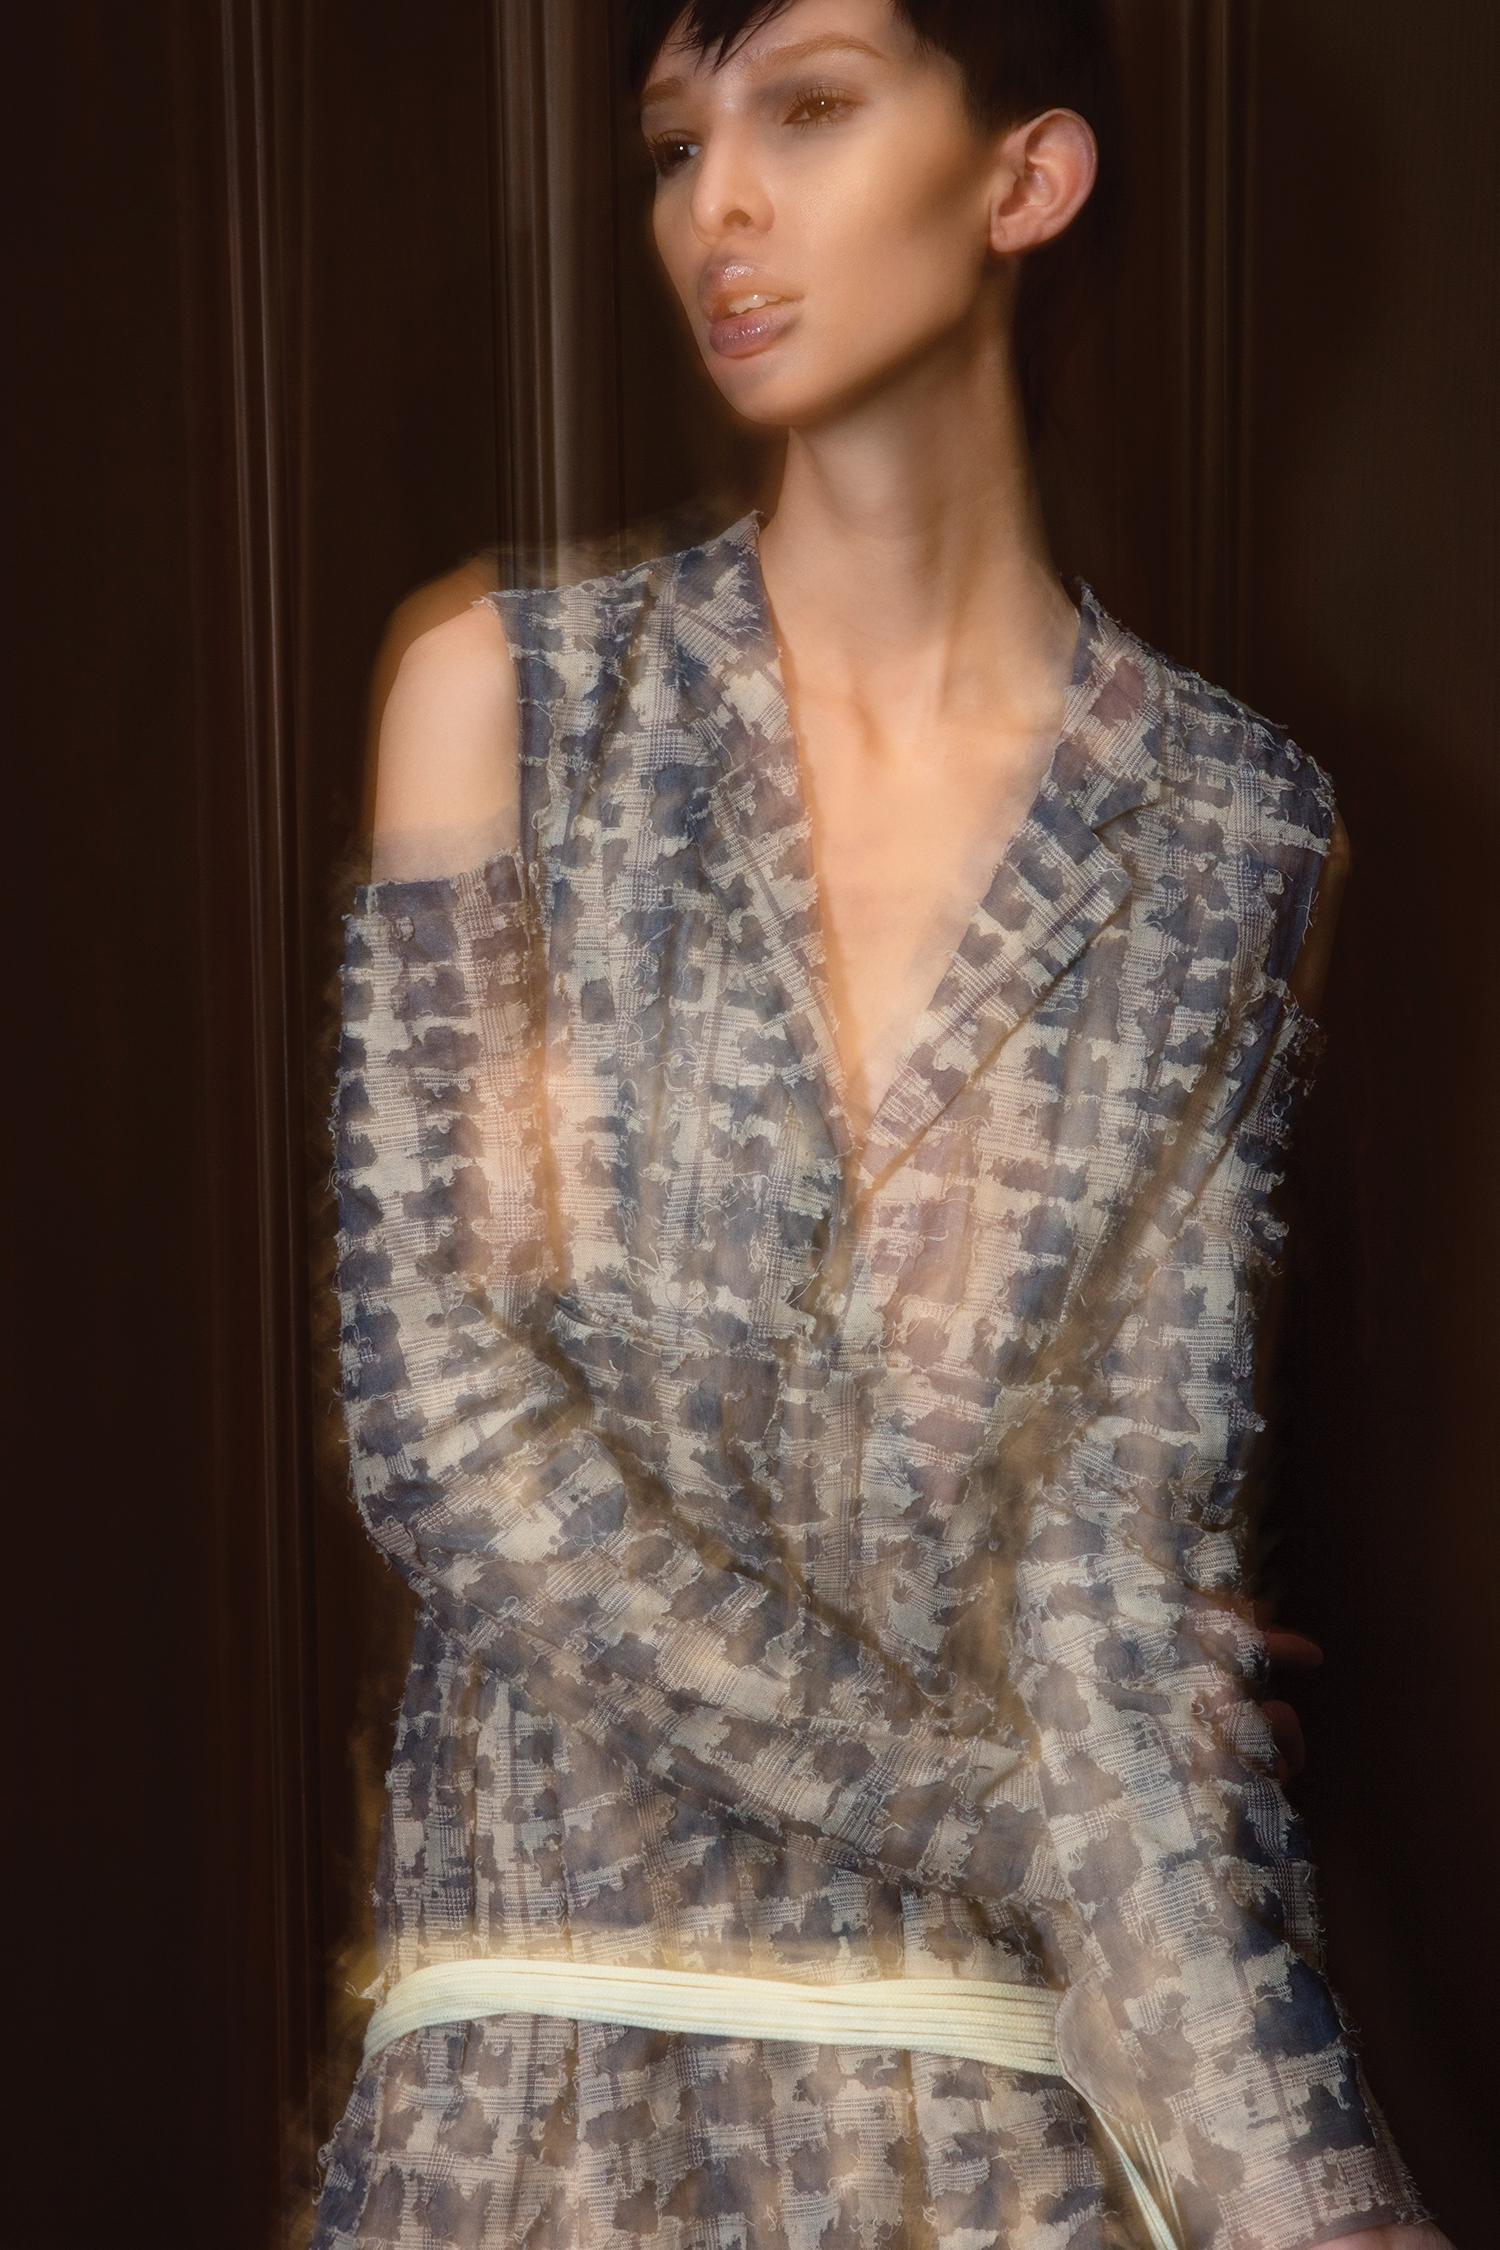 Jumpsuit by Dora Li, MFA Fashion Design. Suspenders used as belt by Brandon Kee, BFA Menswear Design.